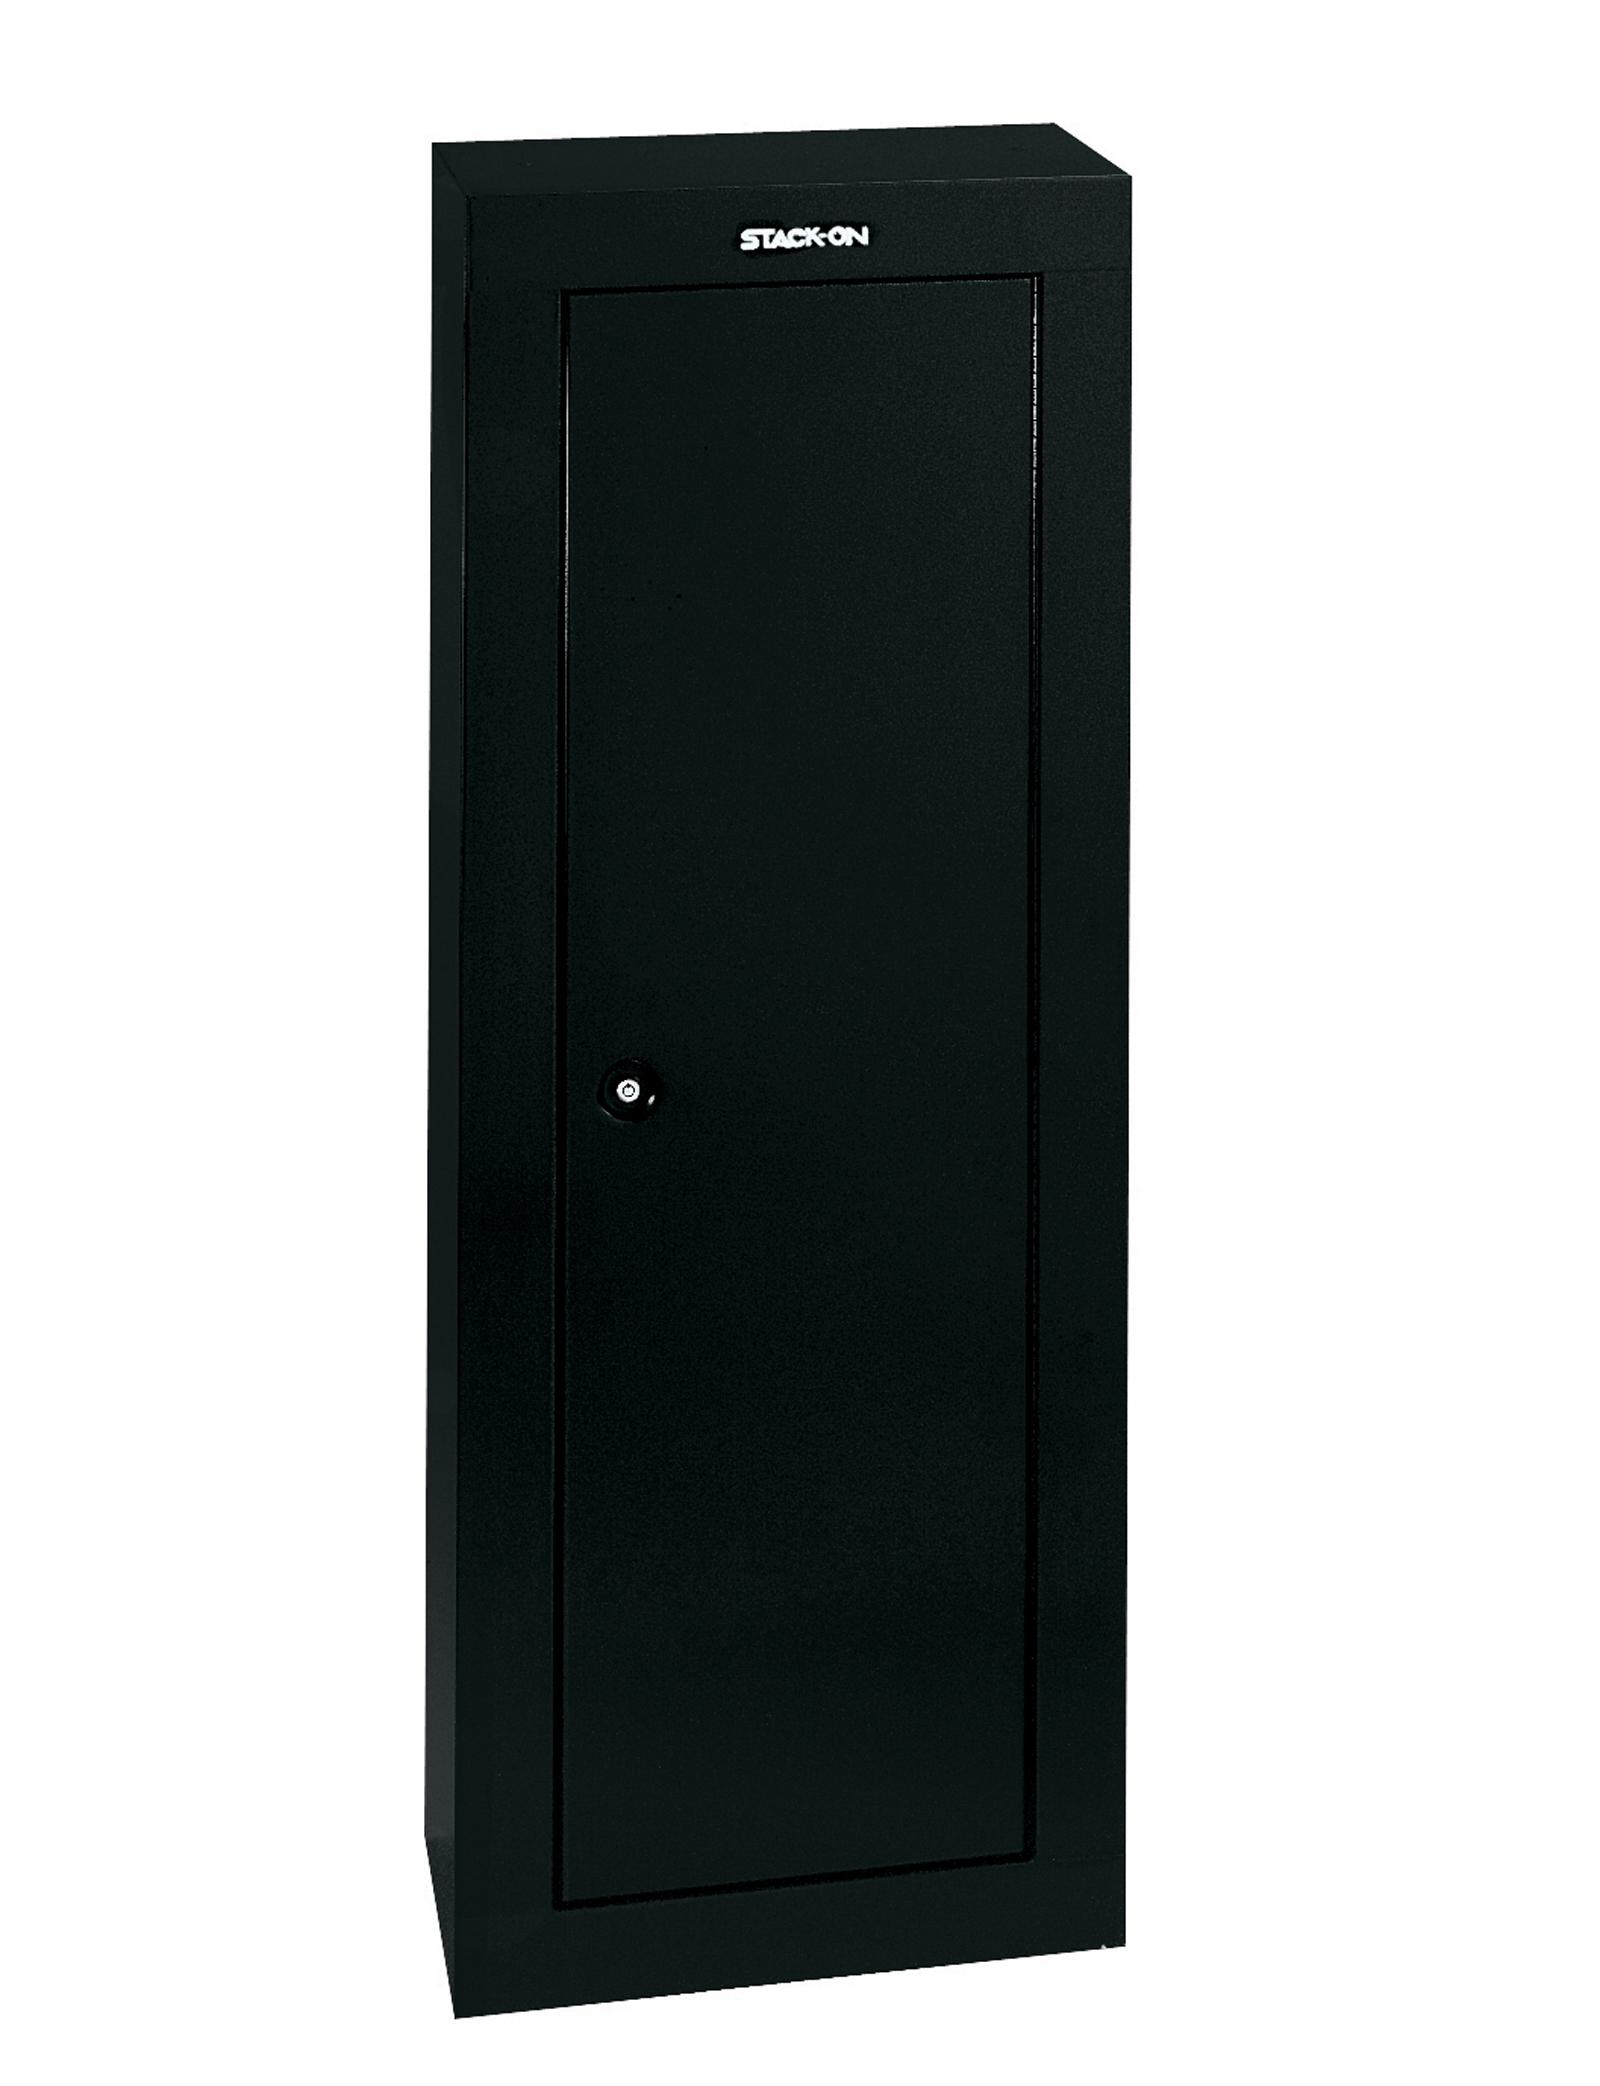 StackOn 8Gun Security Cabinet Black